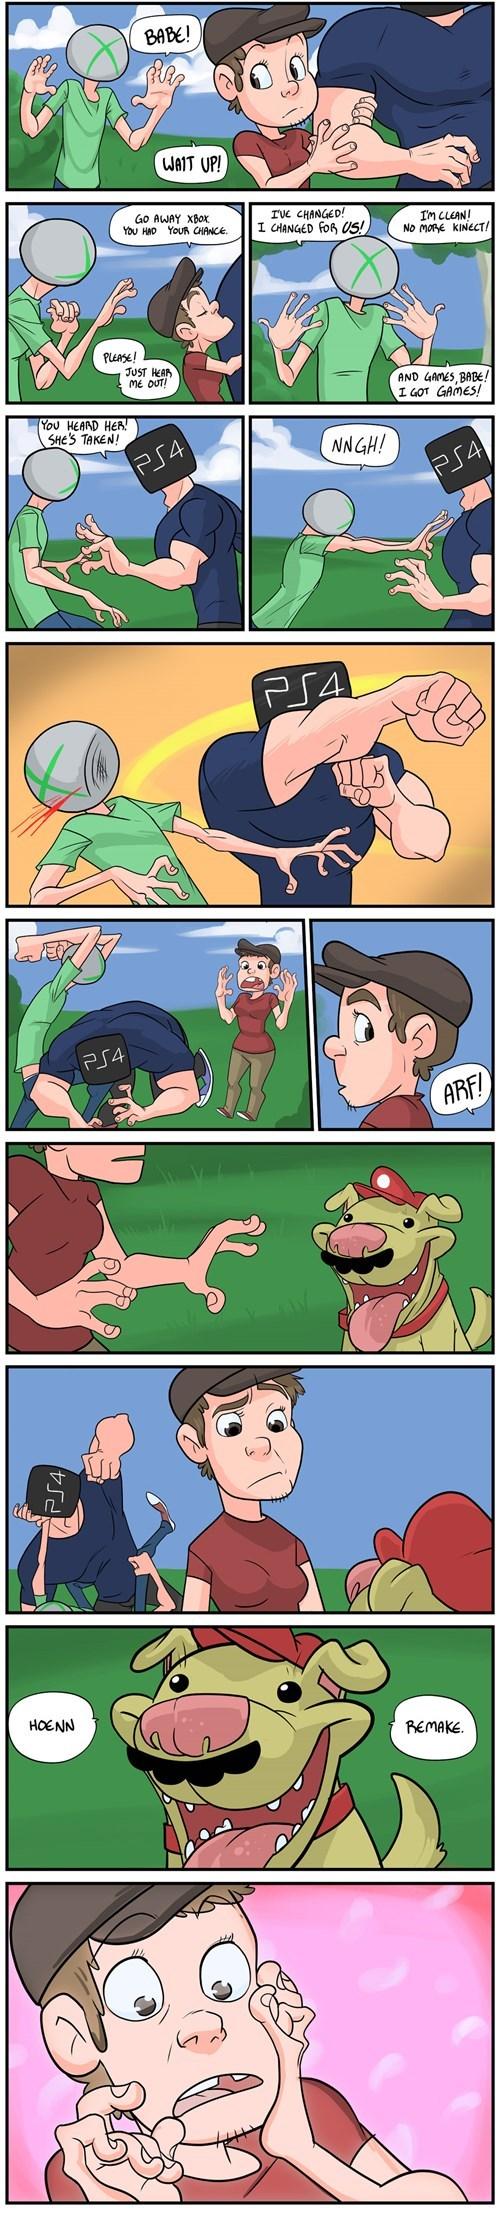 gaming gamers video games web comics hoenn remake